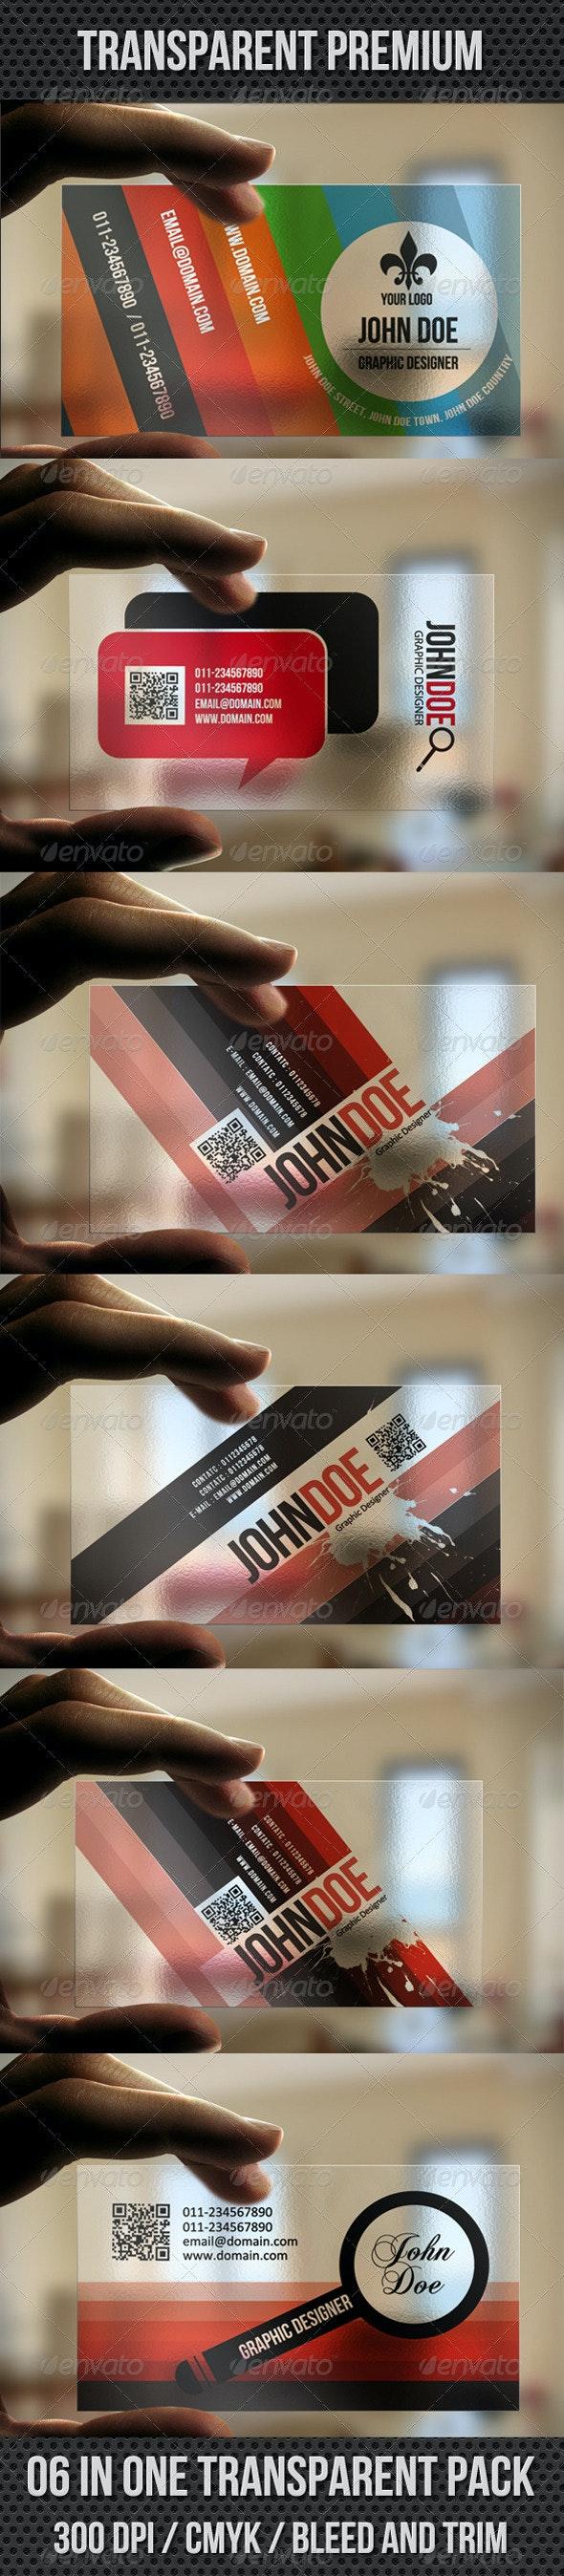 06 In One Transparent Pack - Transparent Premium - Business Cards Print Templates